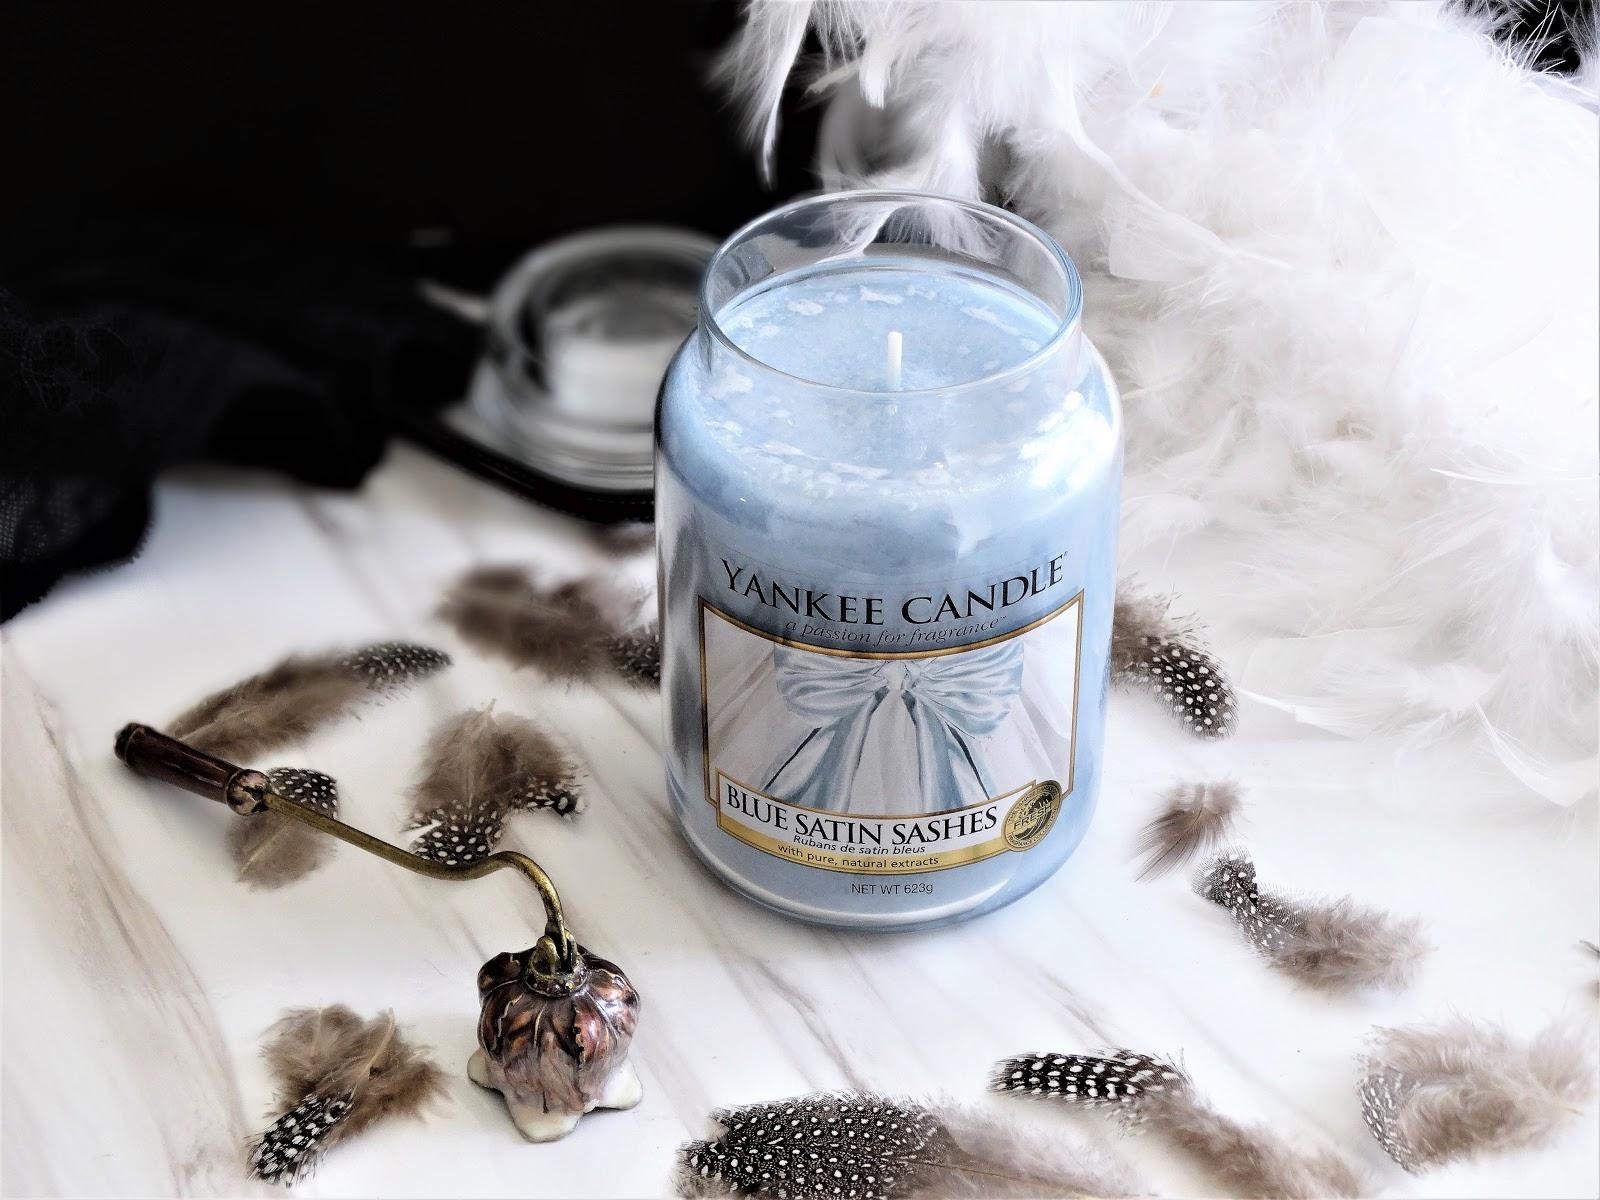 Blue Satin Sashes De Yankee Candle Ambiance Et Fragrance